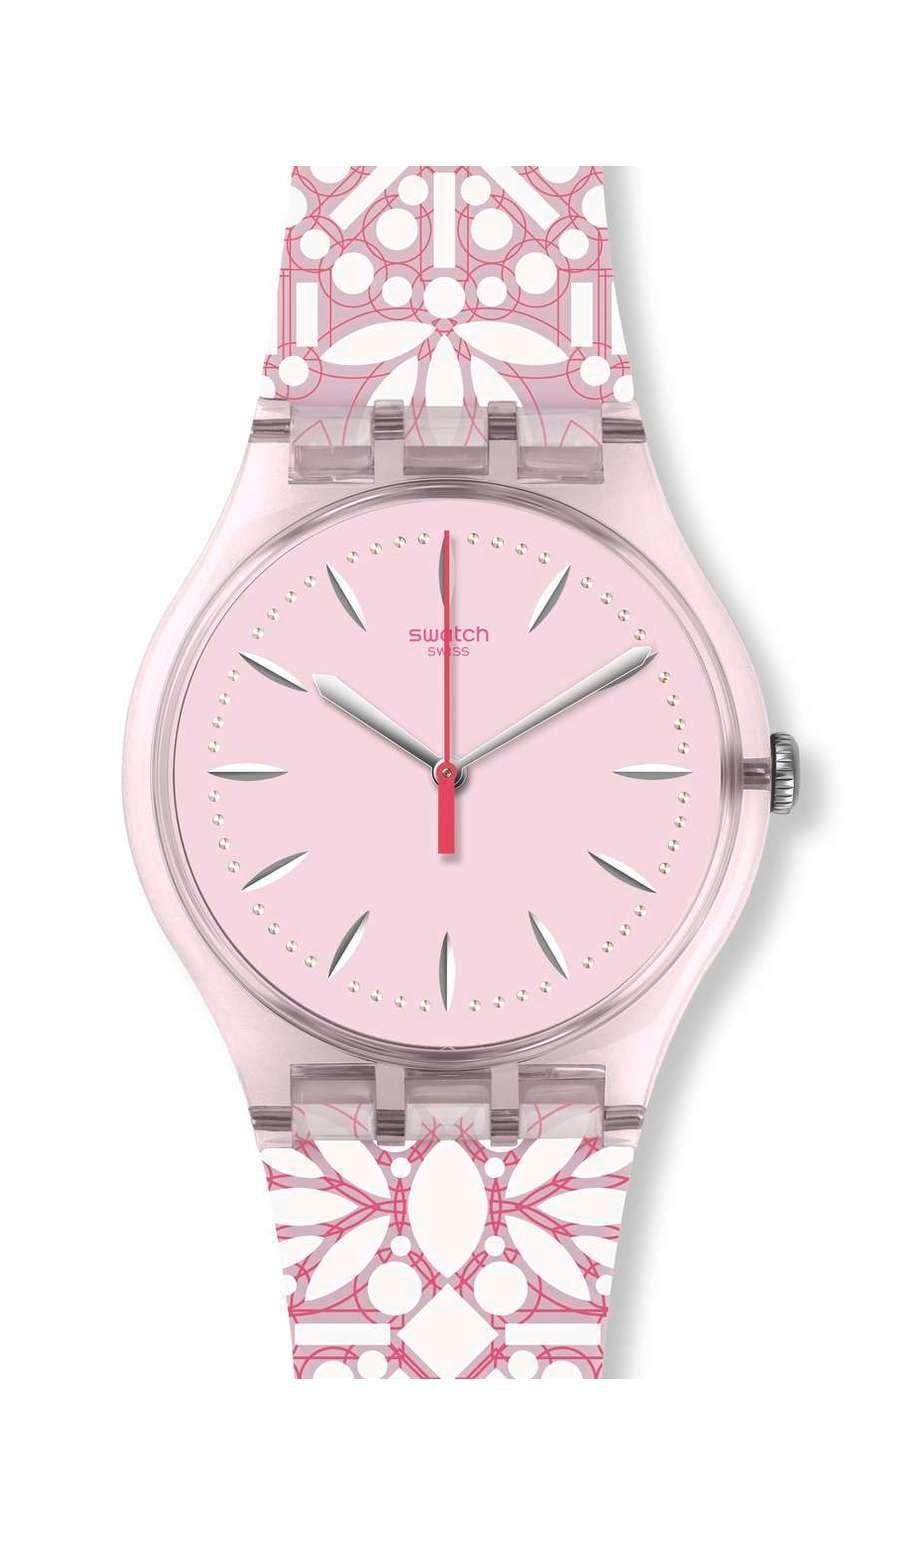 Swatch - FLEURIE - 1